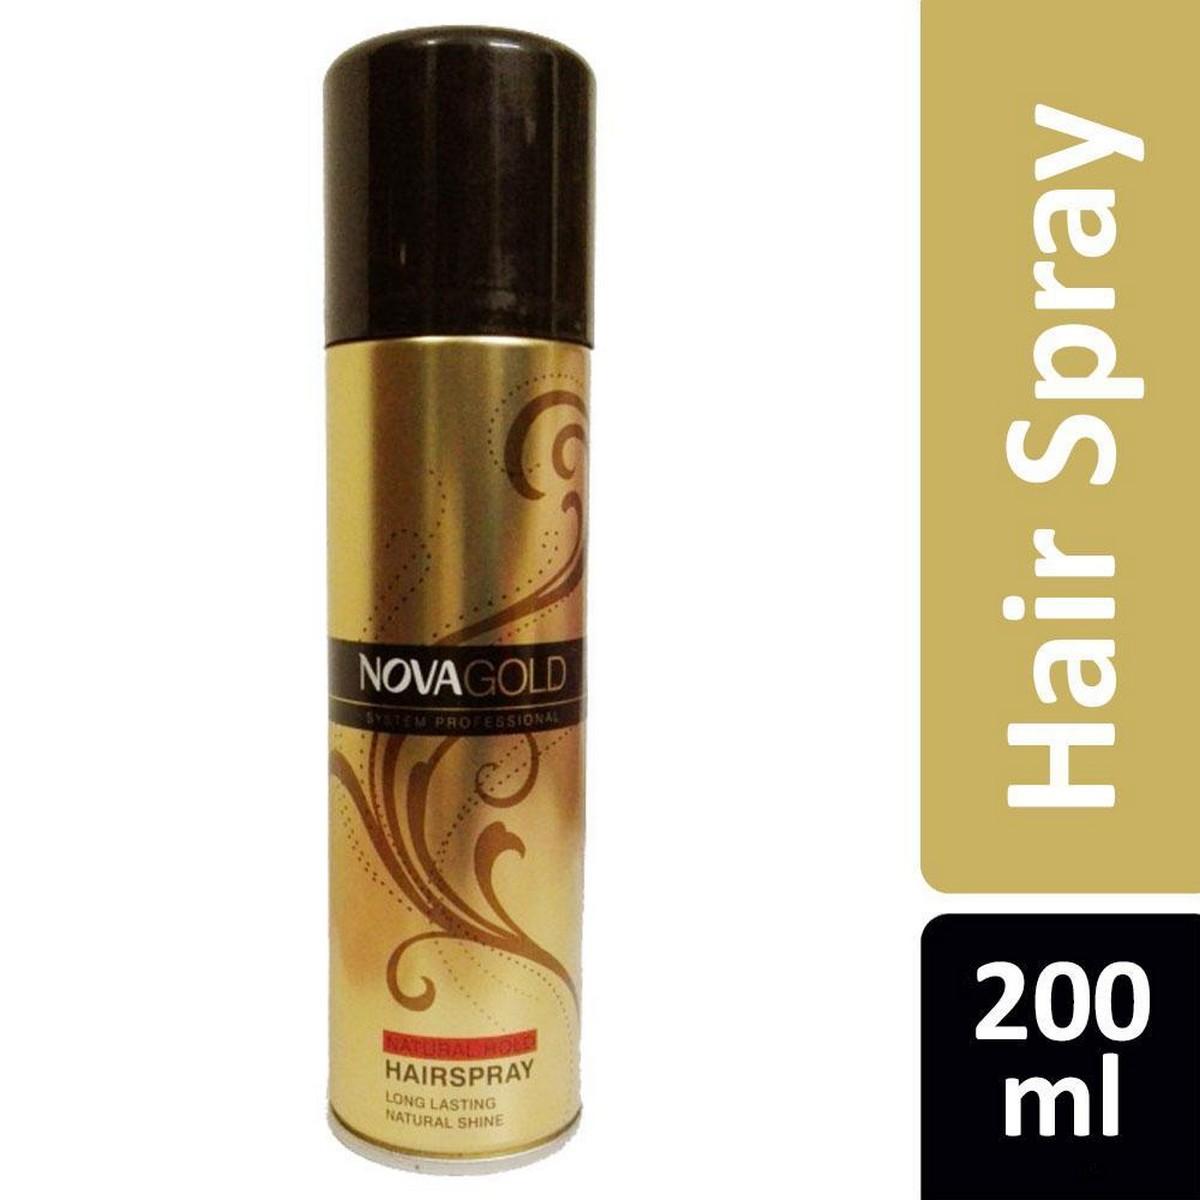 Nova Gold Hair Spray - Super Firm Hold - 200ml